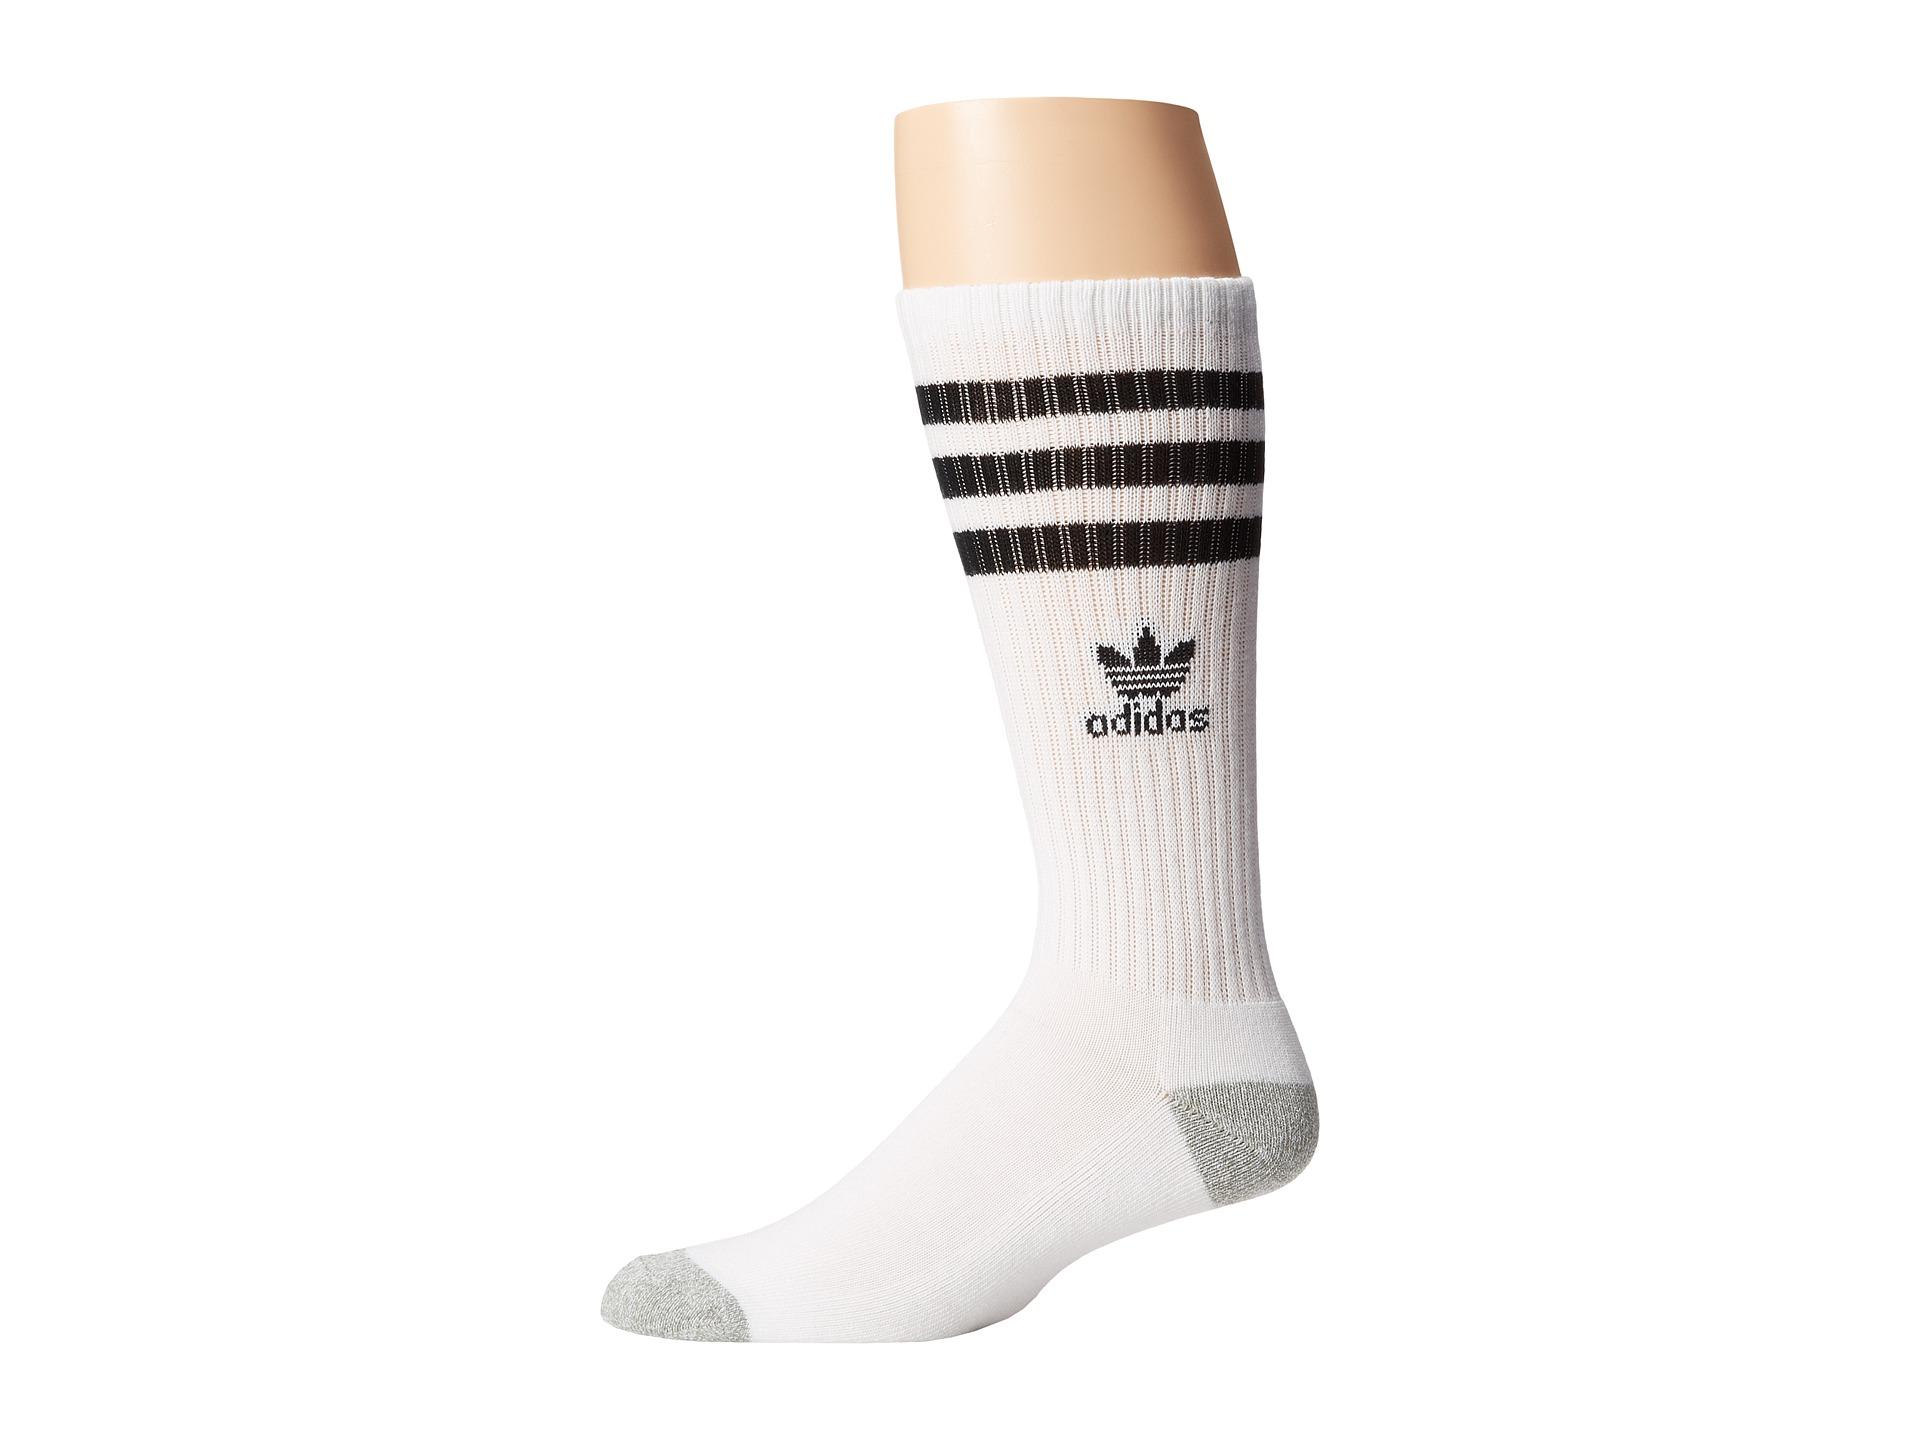 old school adidas socks